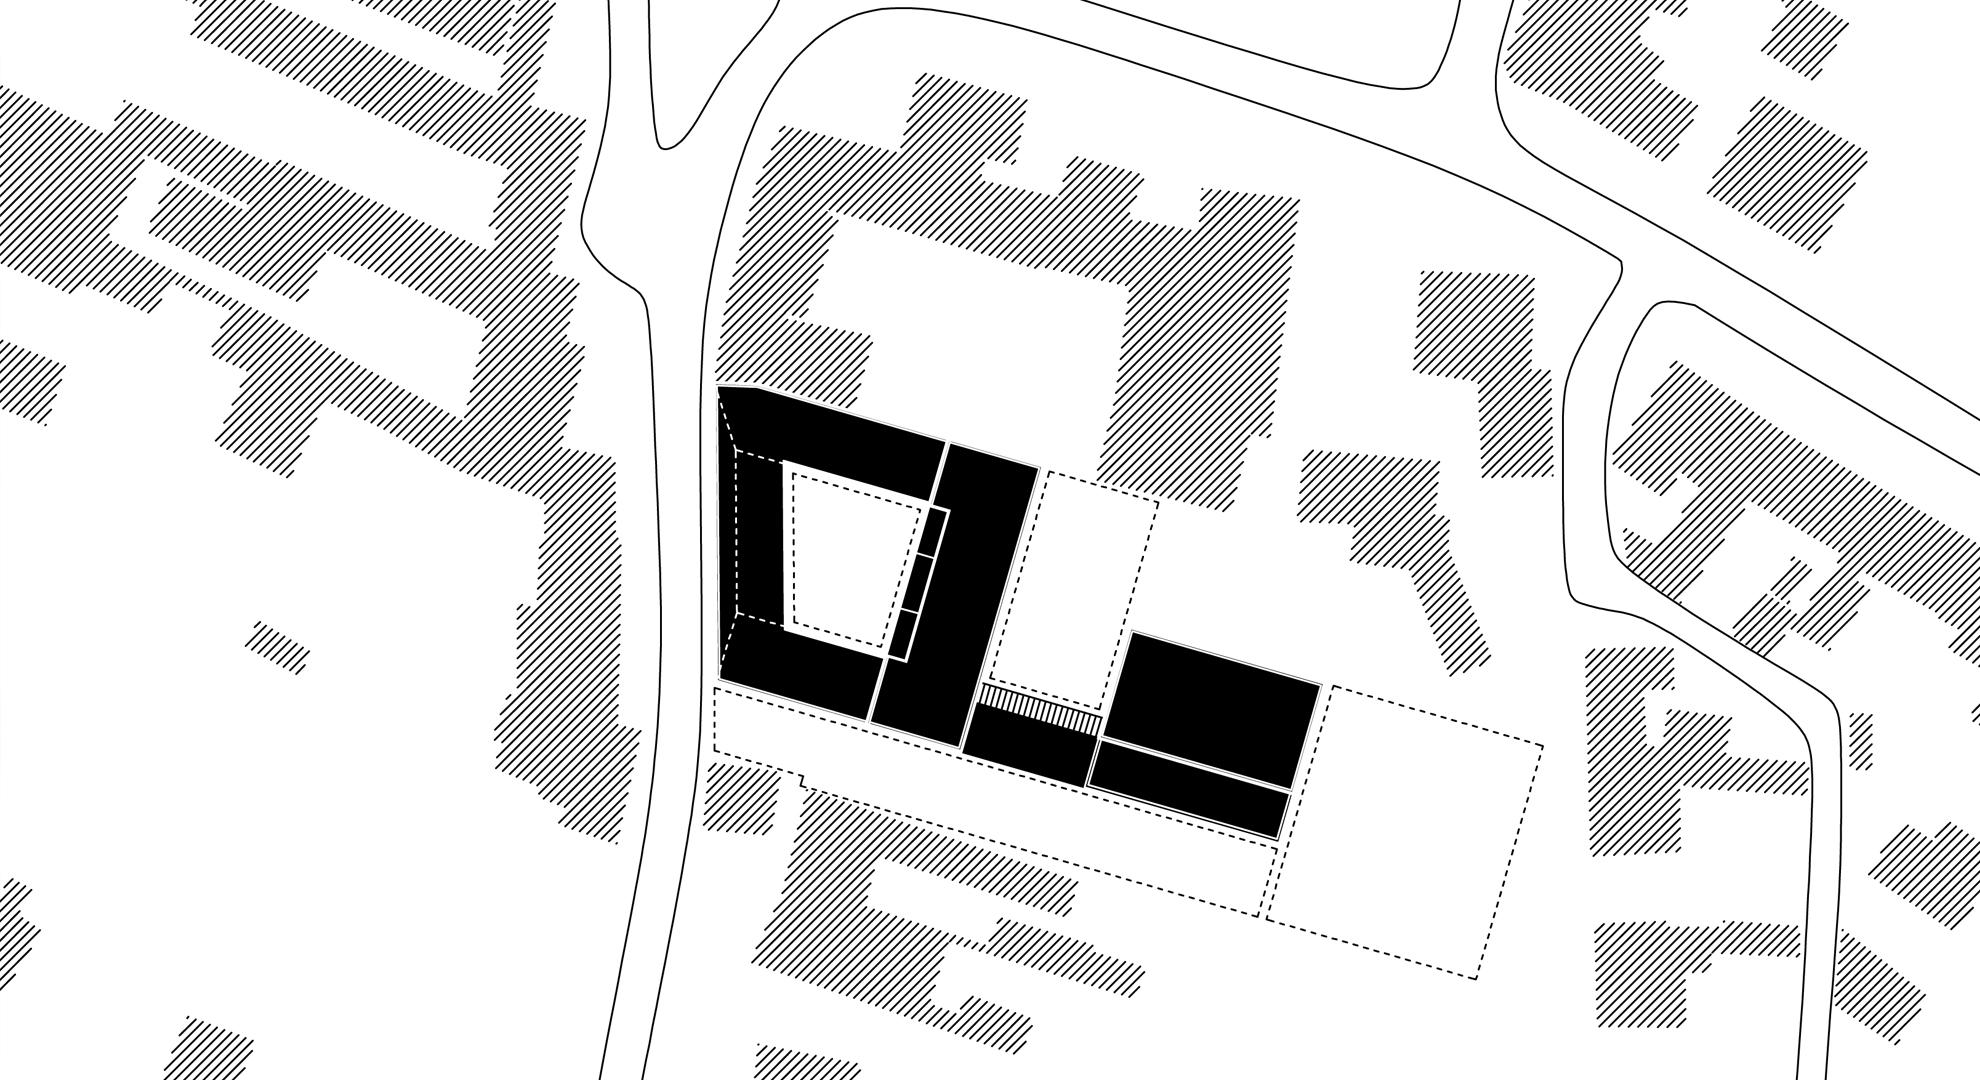 03_Strukturplan